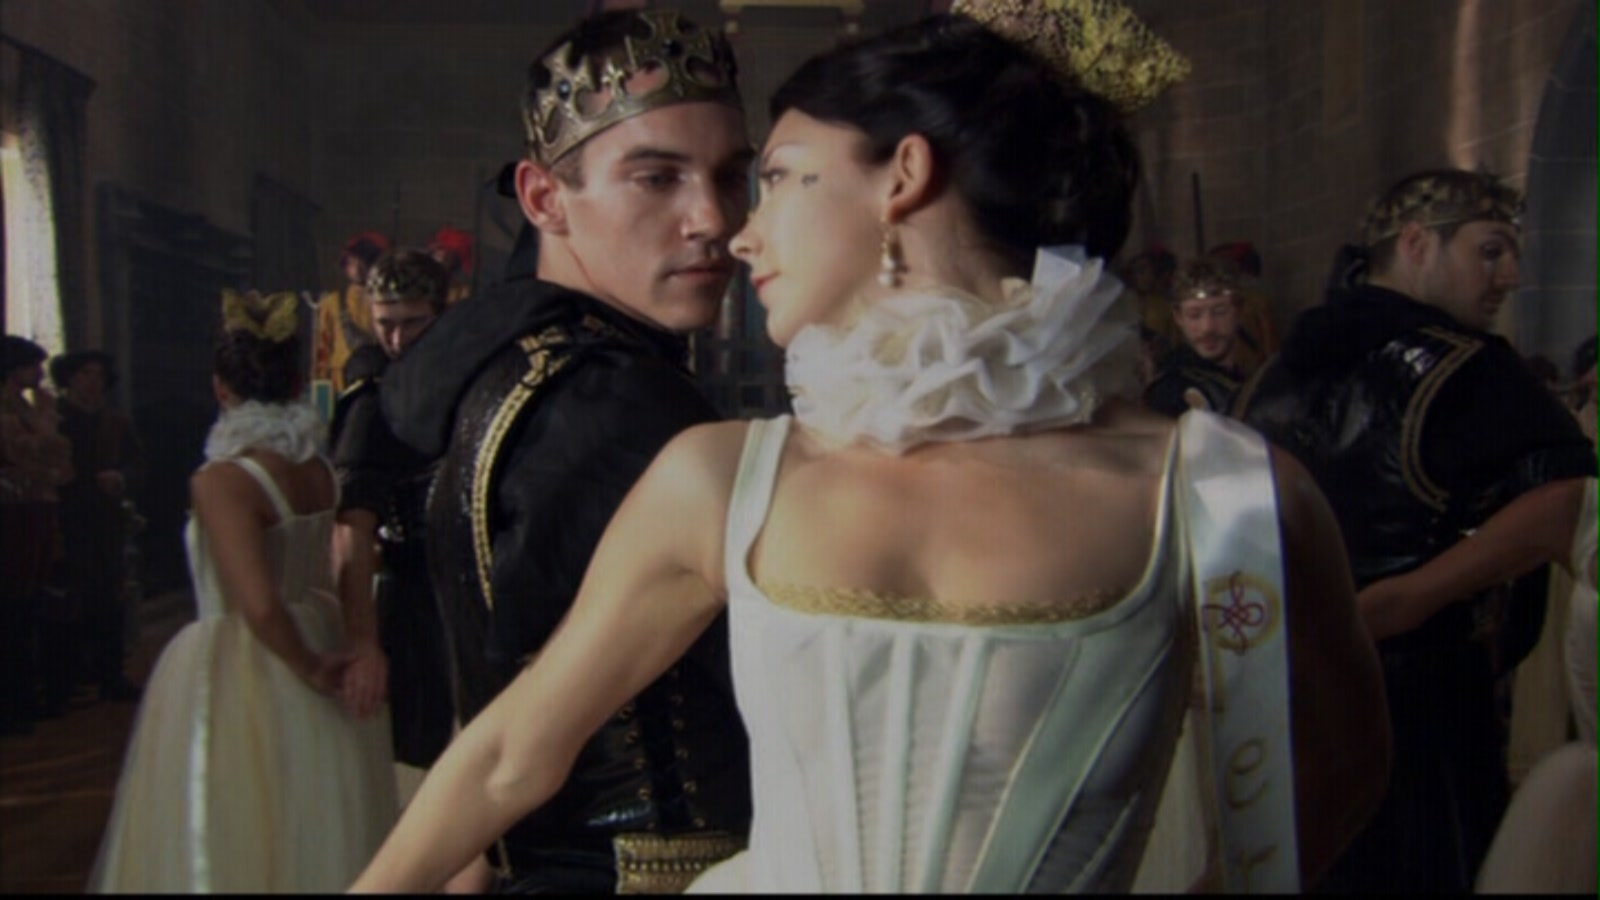 Natalie Dormer As Anne Boleyn Pictures